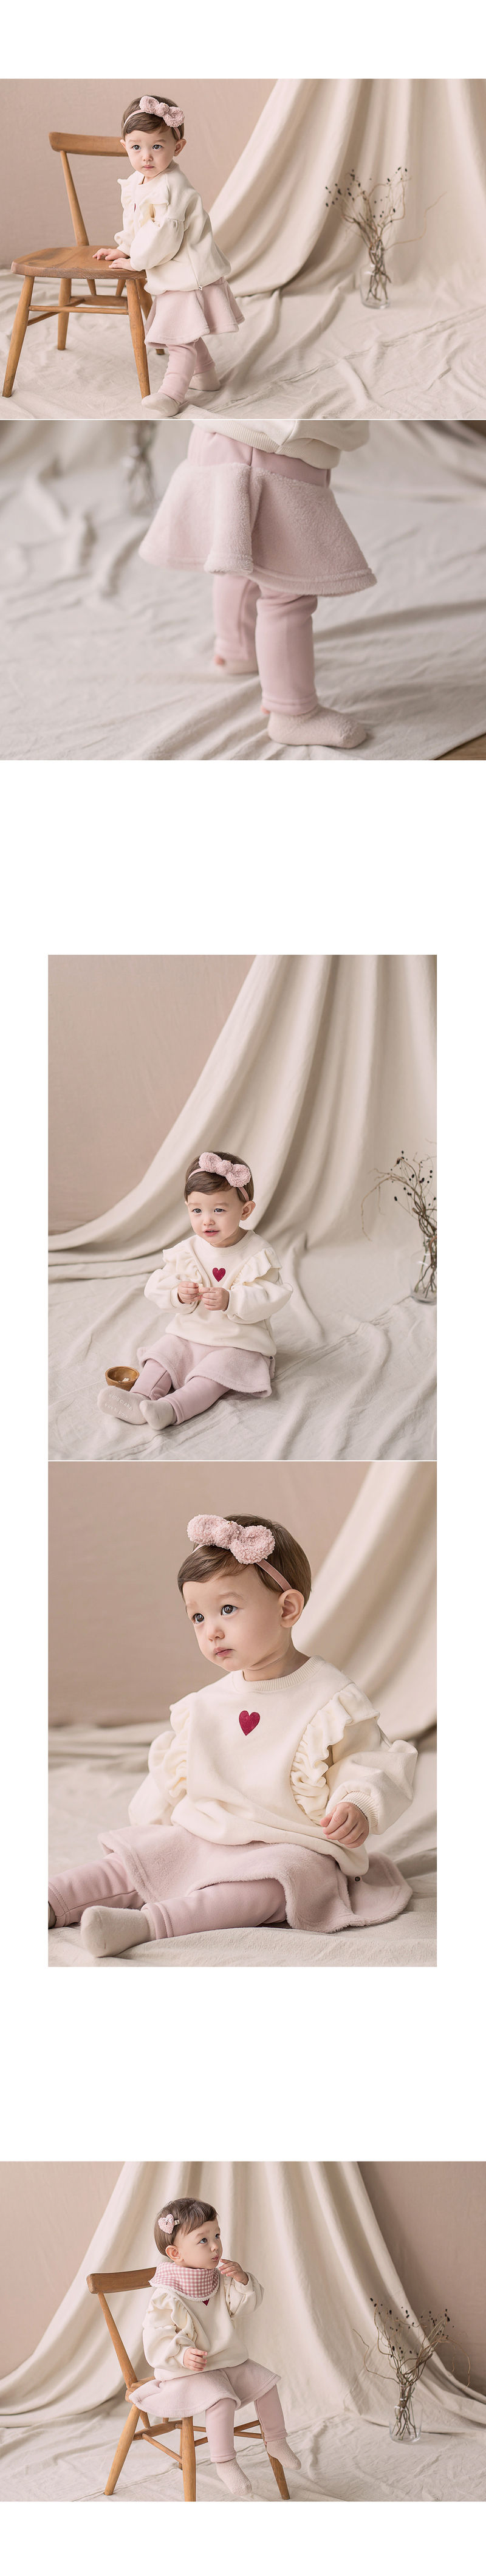 HAPPY PRINCE - Korean Children Fashion - #Kfashion4kids - Czech Fleece Lined Skirt Leggings - 4